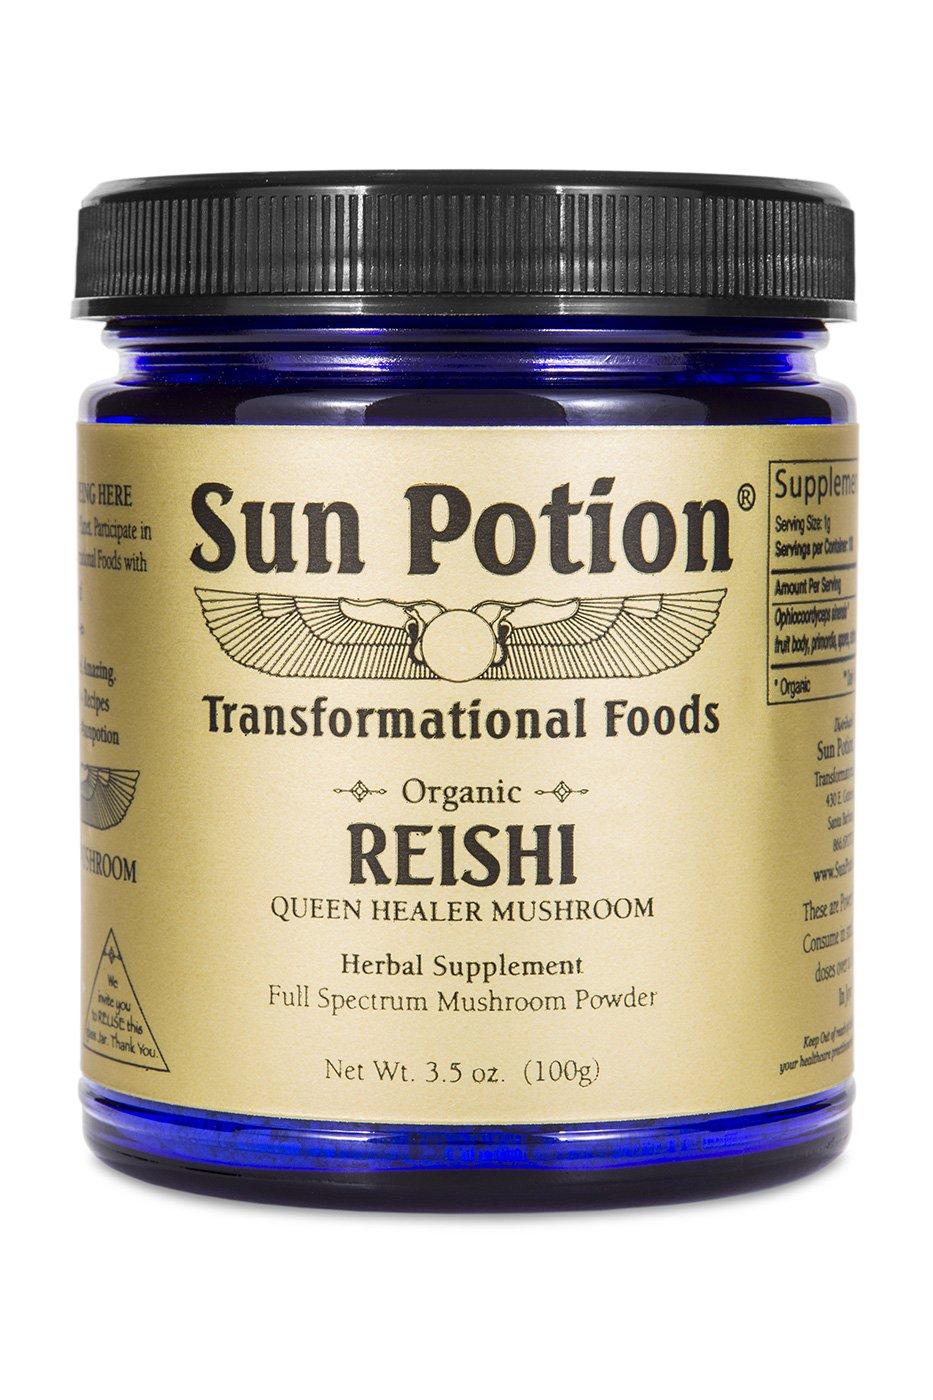 Sun Potion  Reishi 100g